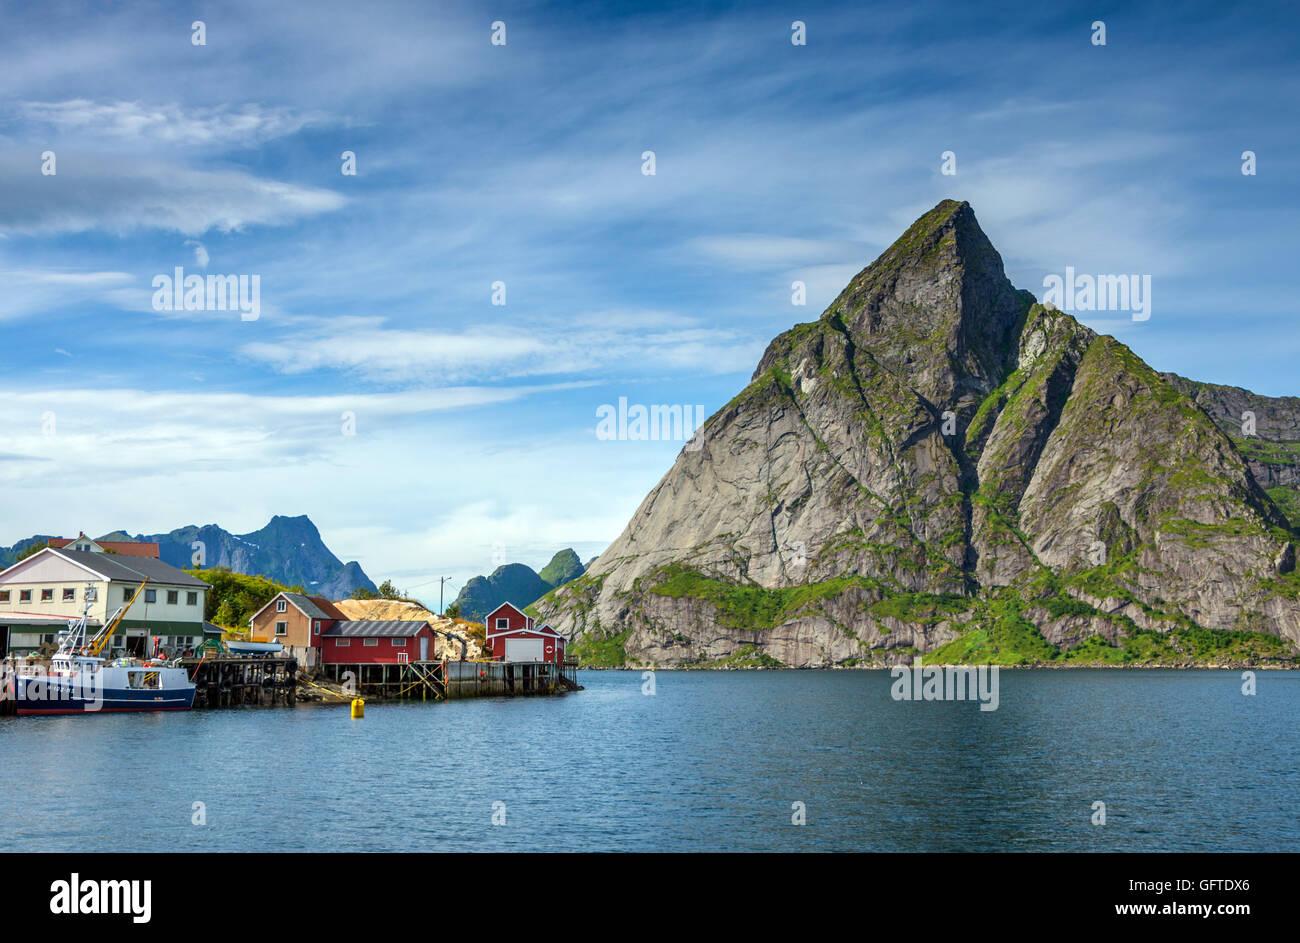 Olstinden mountain seen from Reine, Lofoten Norway - Stock Image